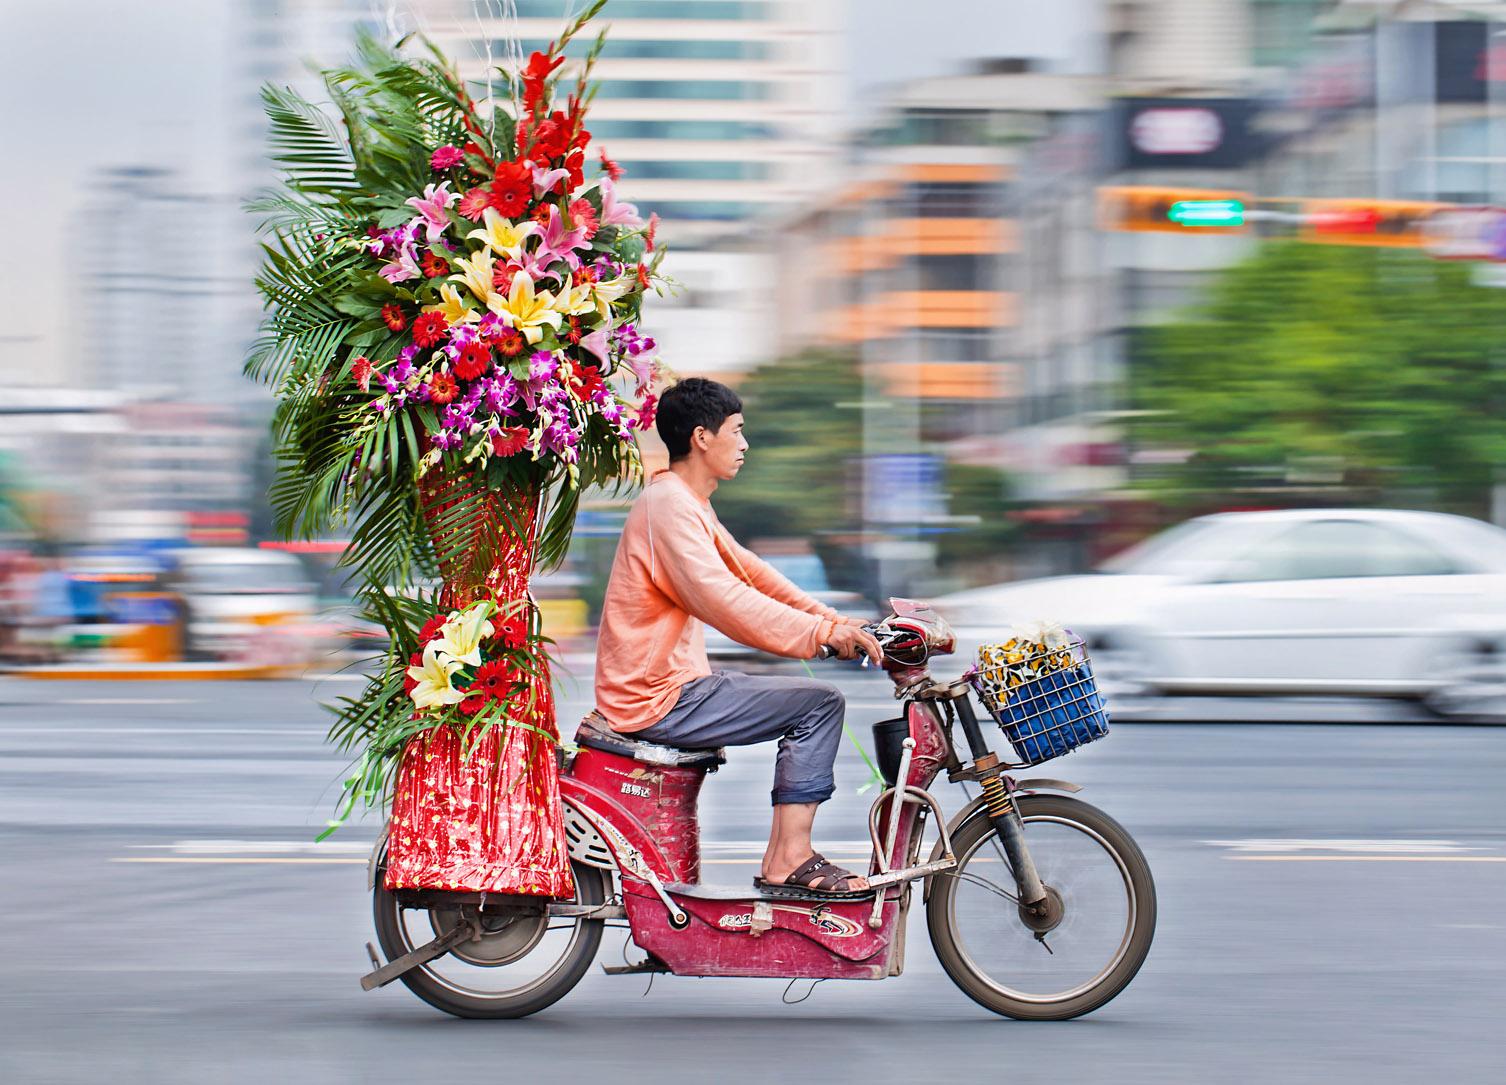 Mini-bloemencorso op de afgeragde e-bike